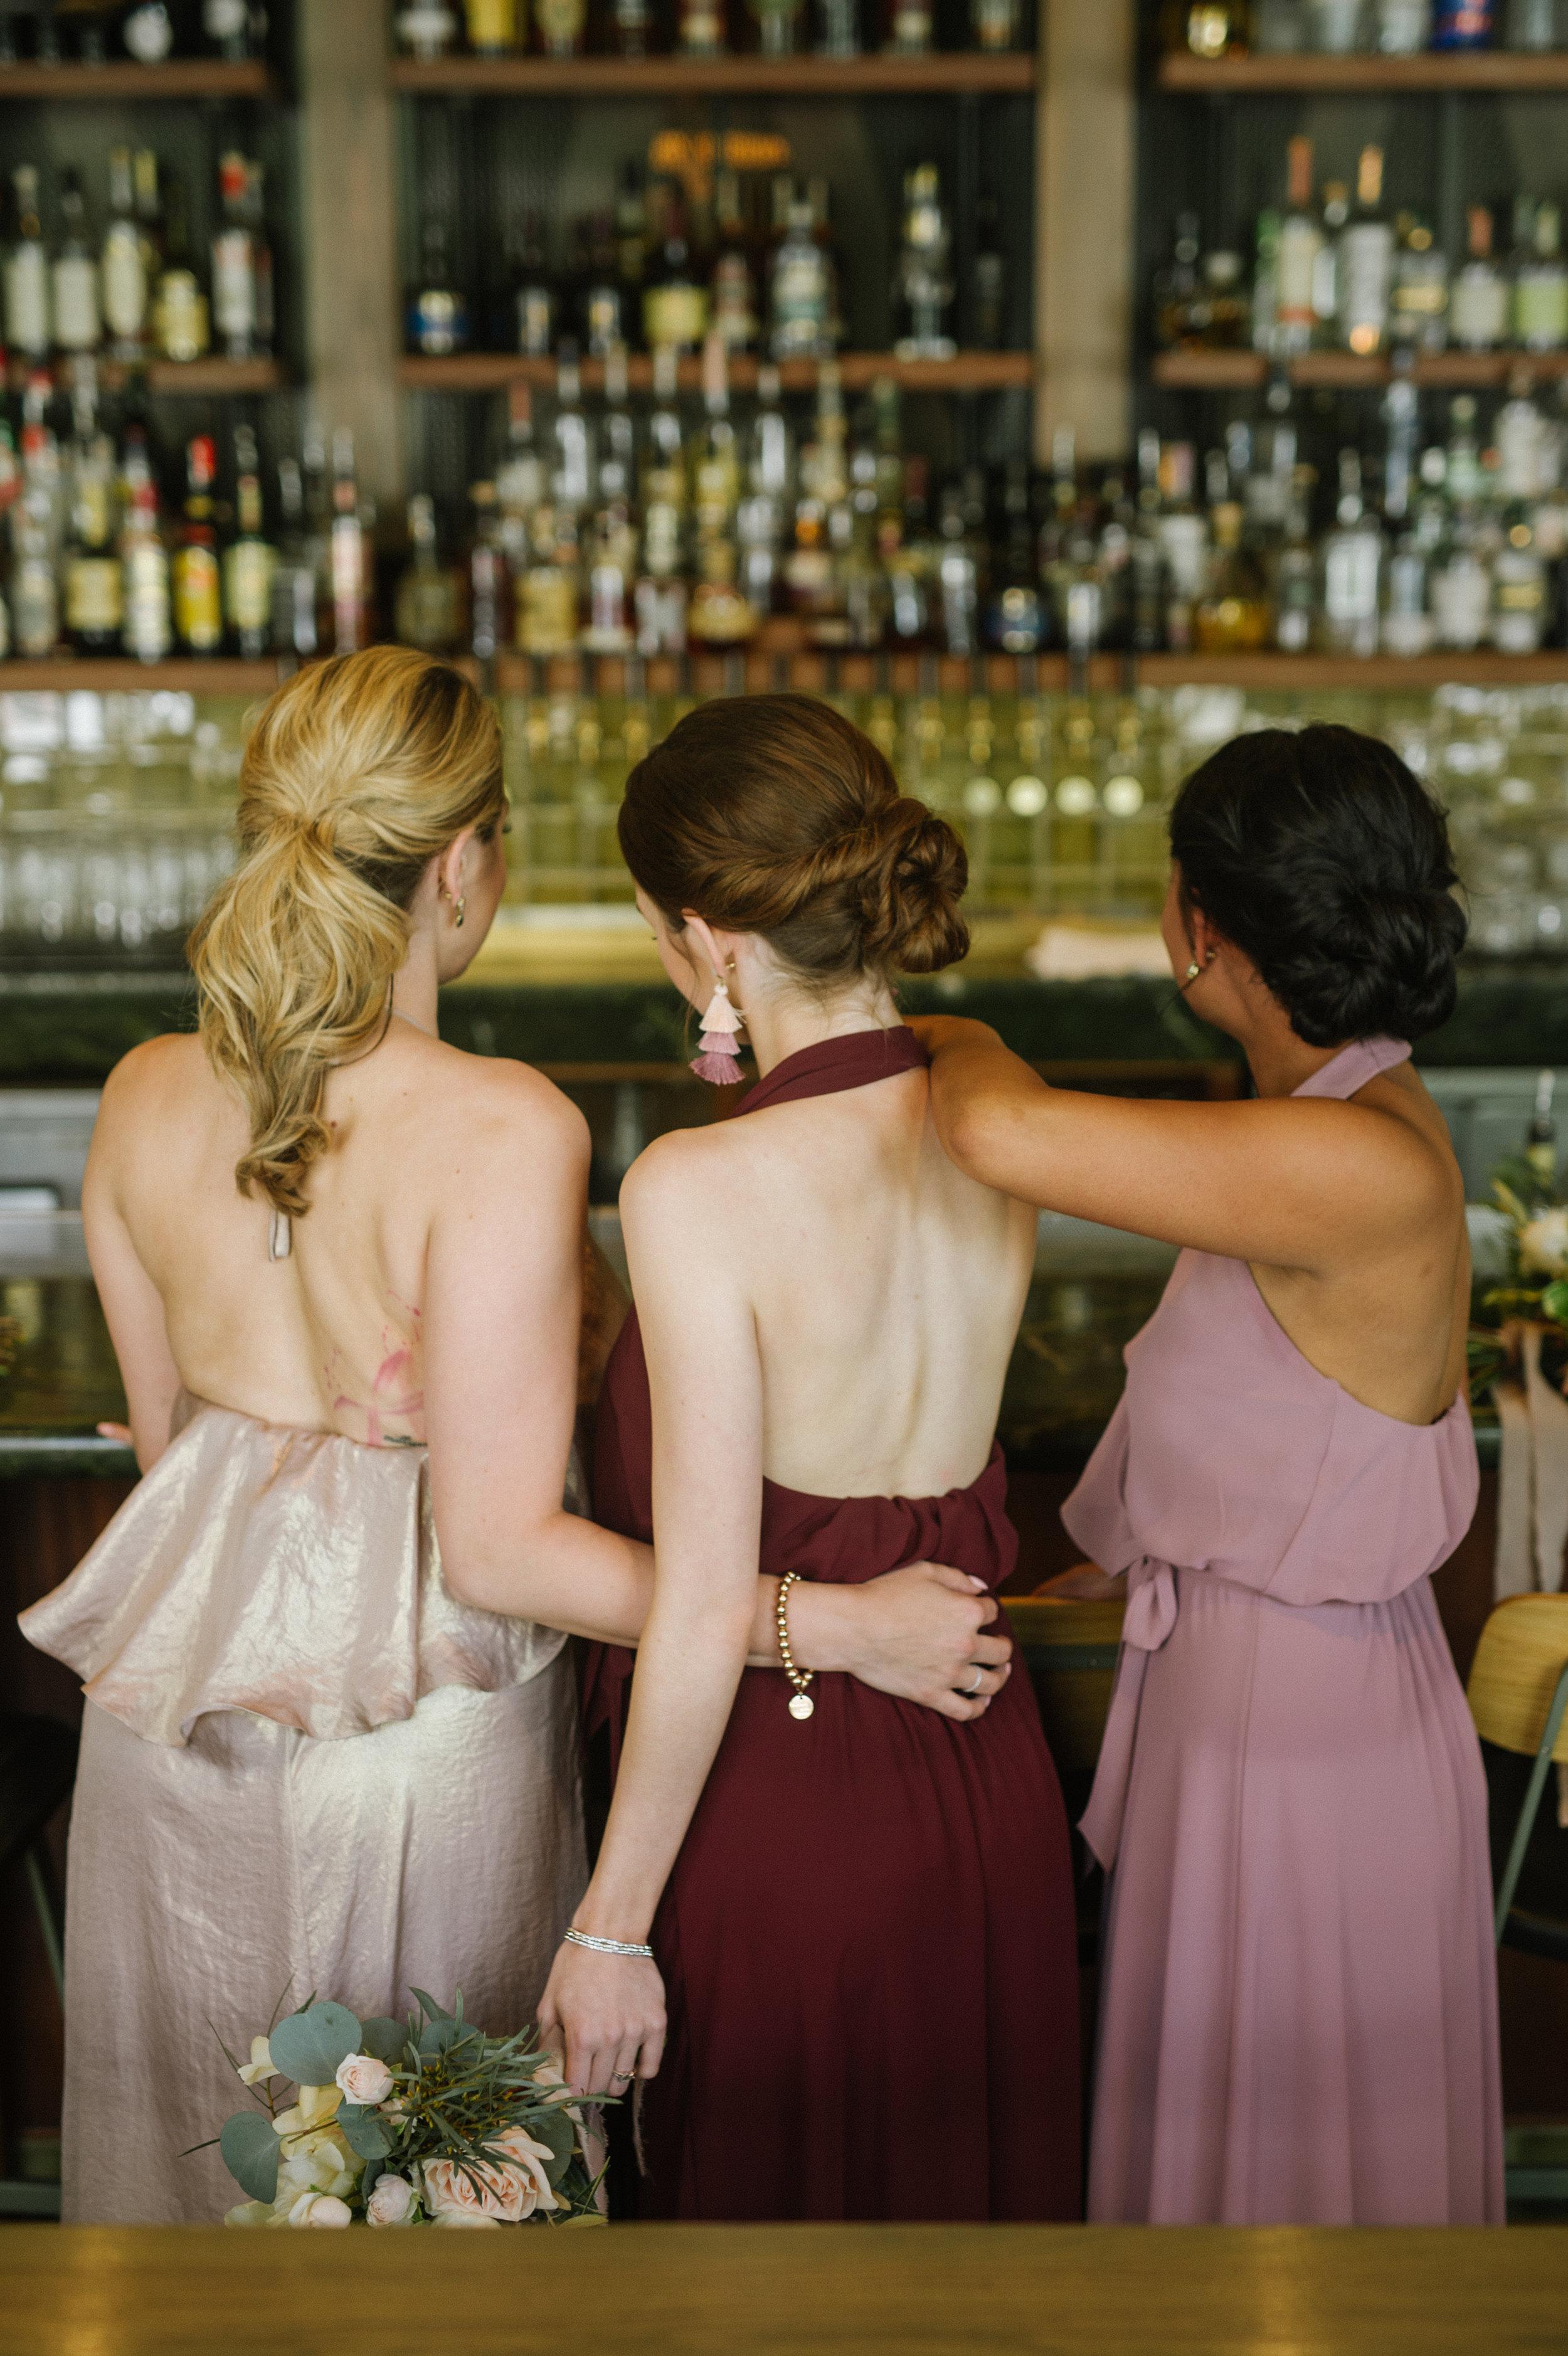 Calgary_Wedding_Photography_Bridgette_Bar_Bridesmaids_Shoot_2018_HR054.jpg